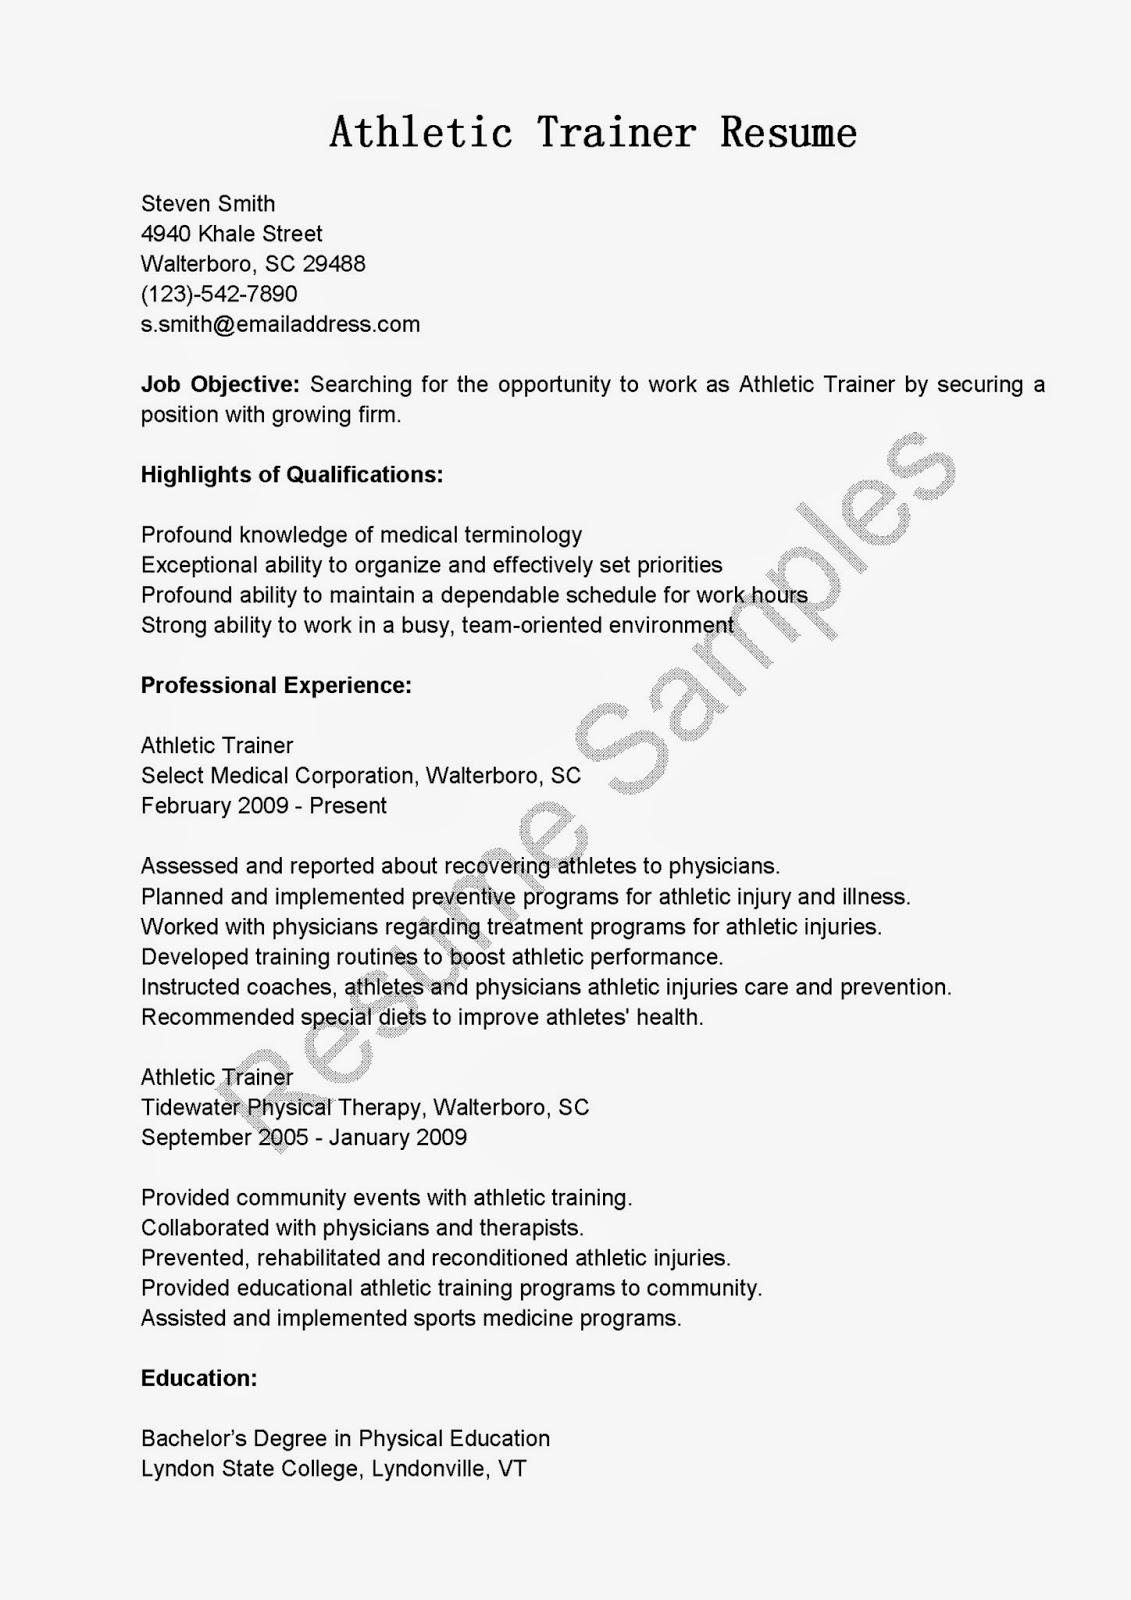 resume samples  athletic trainer resume sample